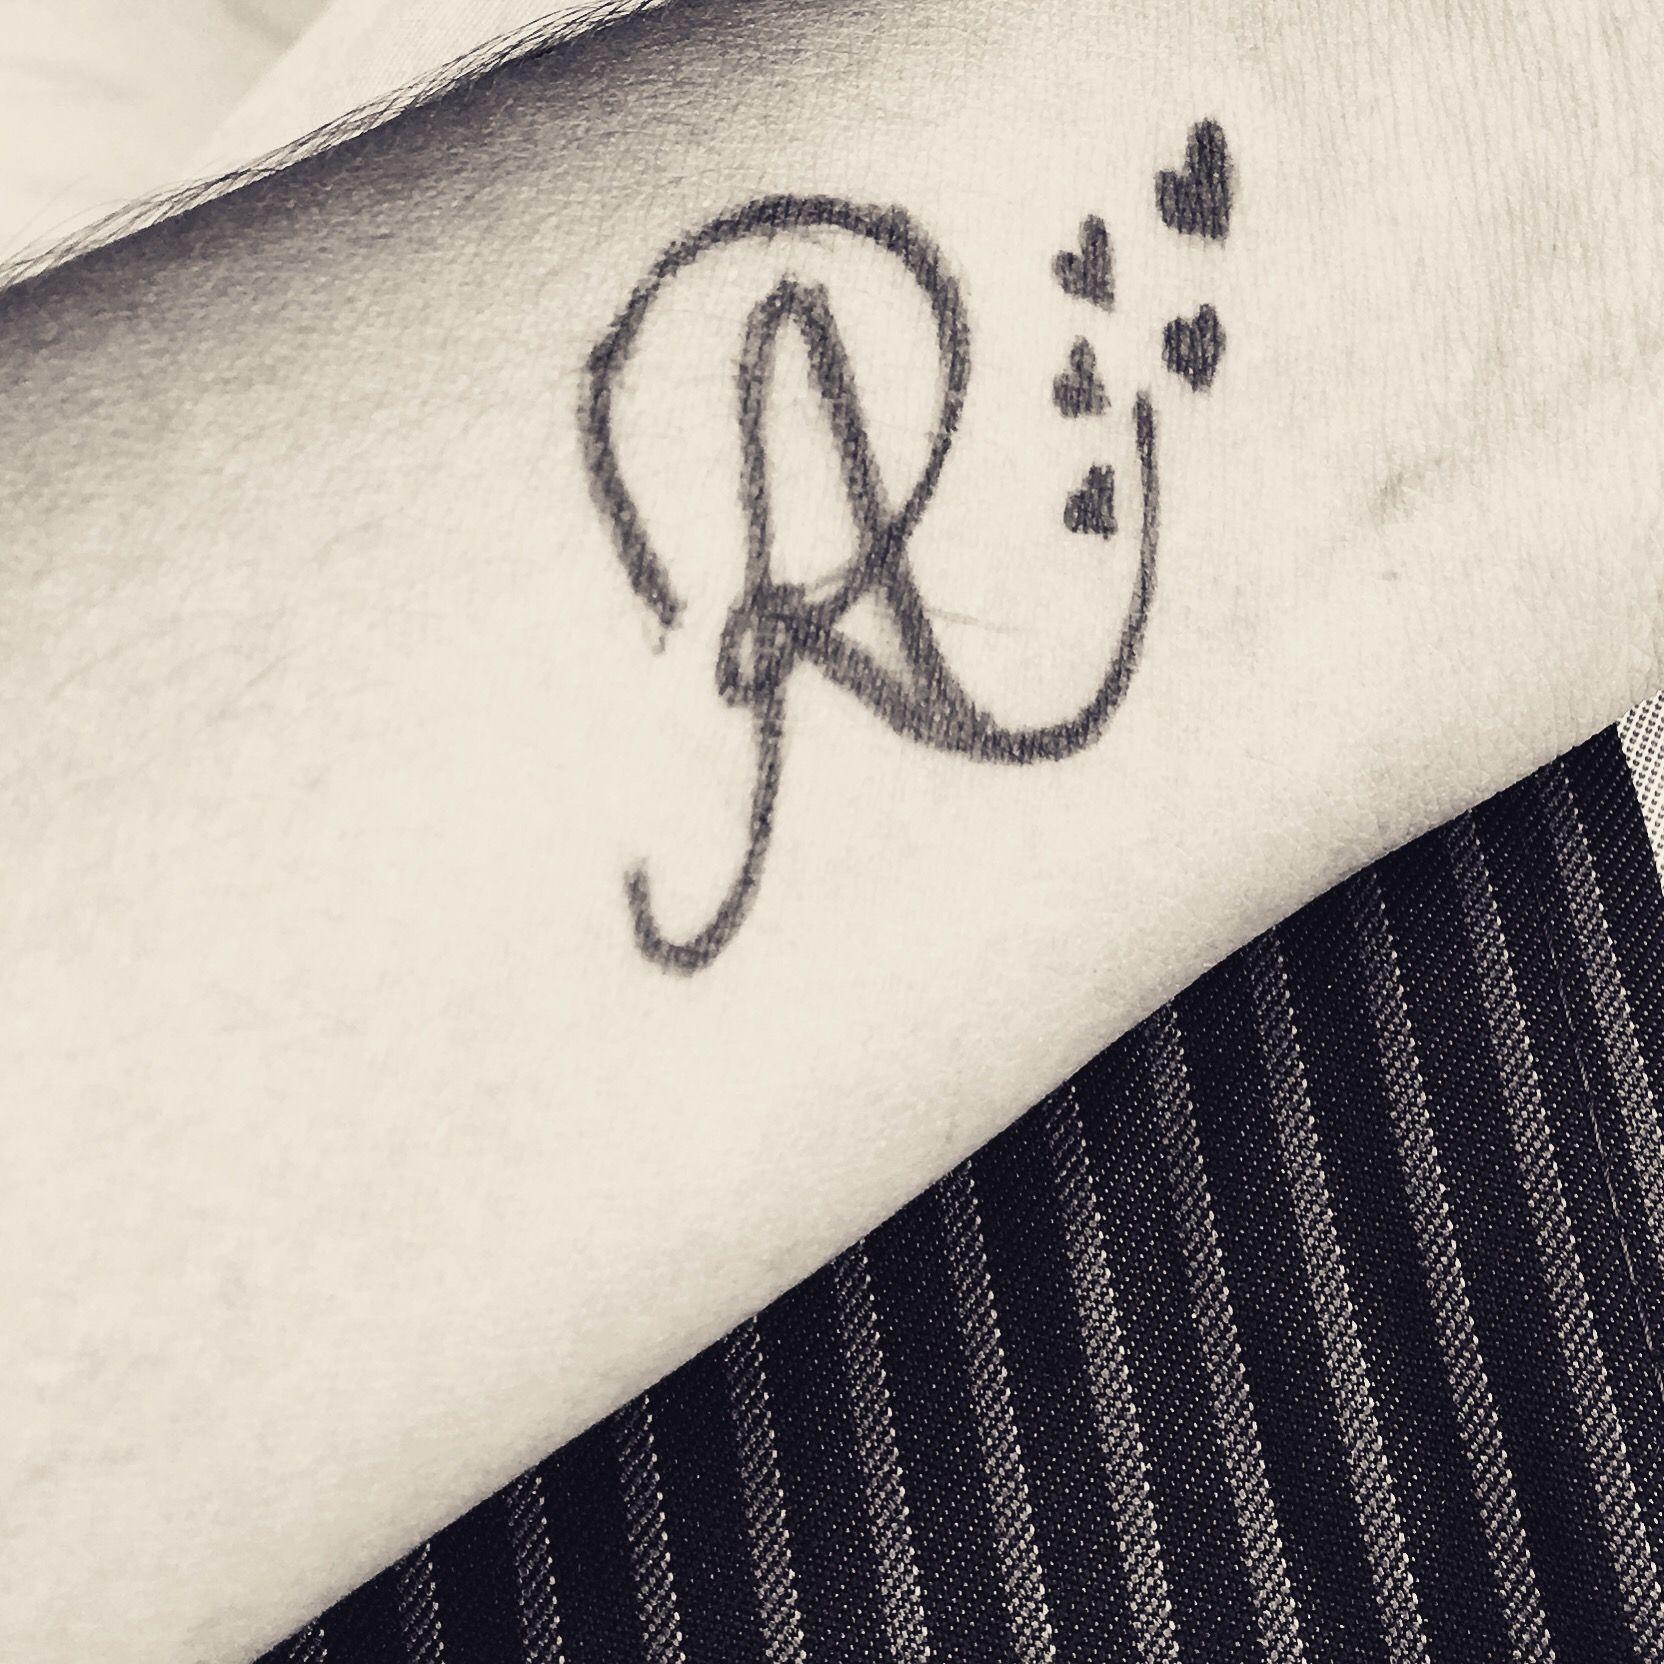 Ar Logo Letter R Tattoo Alphabet Tattoo Designs Tattoo Lettering